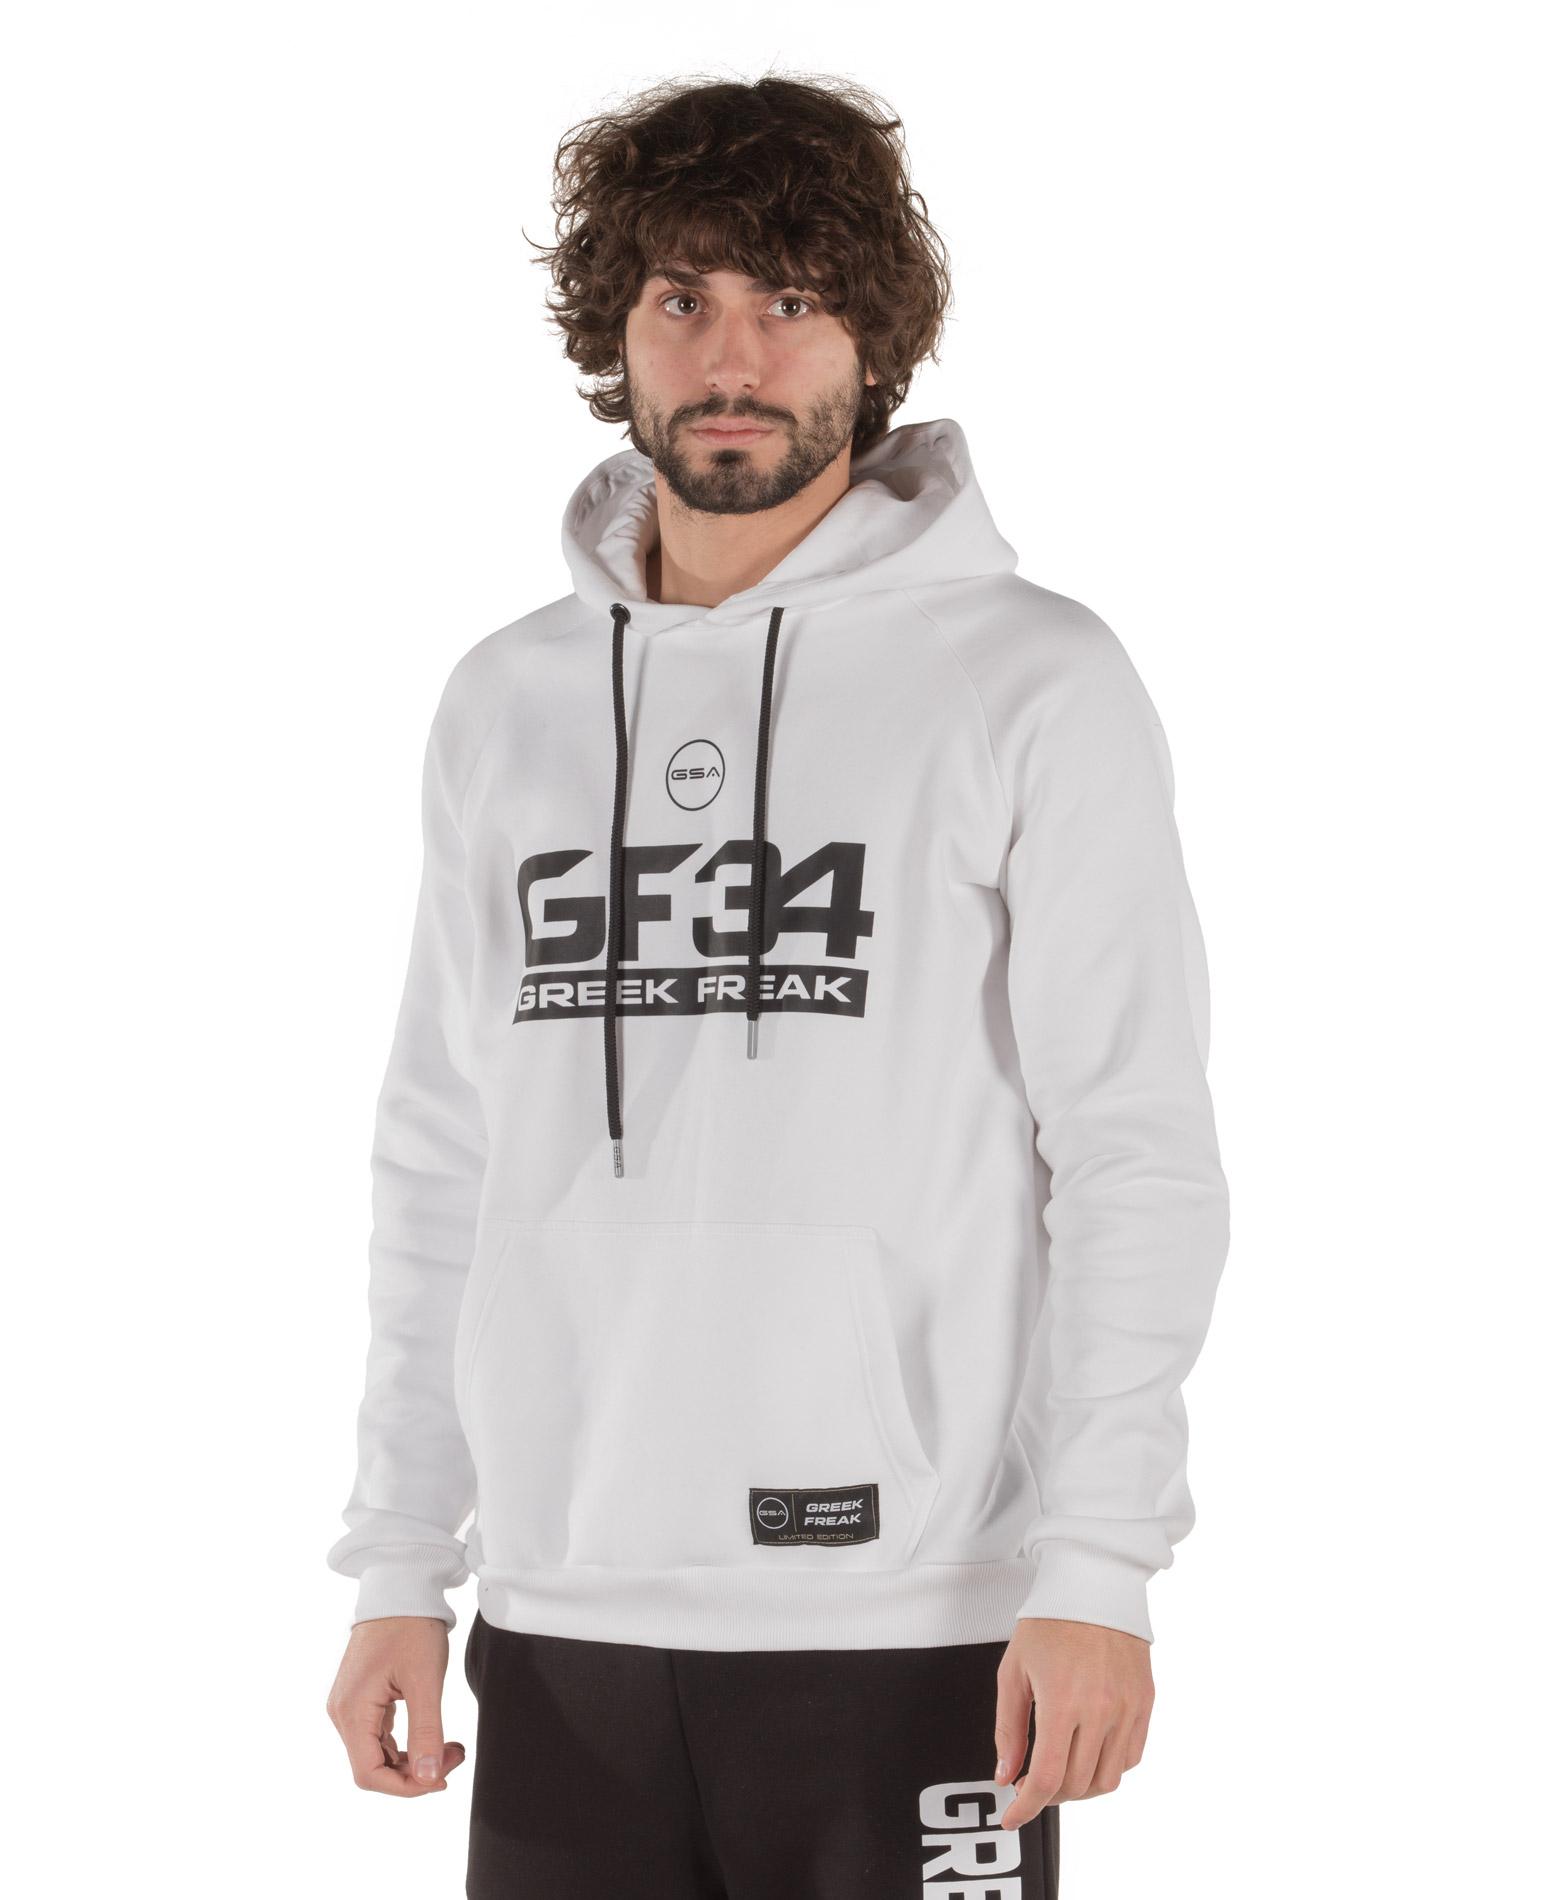 GSA X GREEK FREAK HOODIE 34-18014-02 STAR WHITE Λευκό